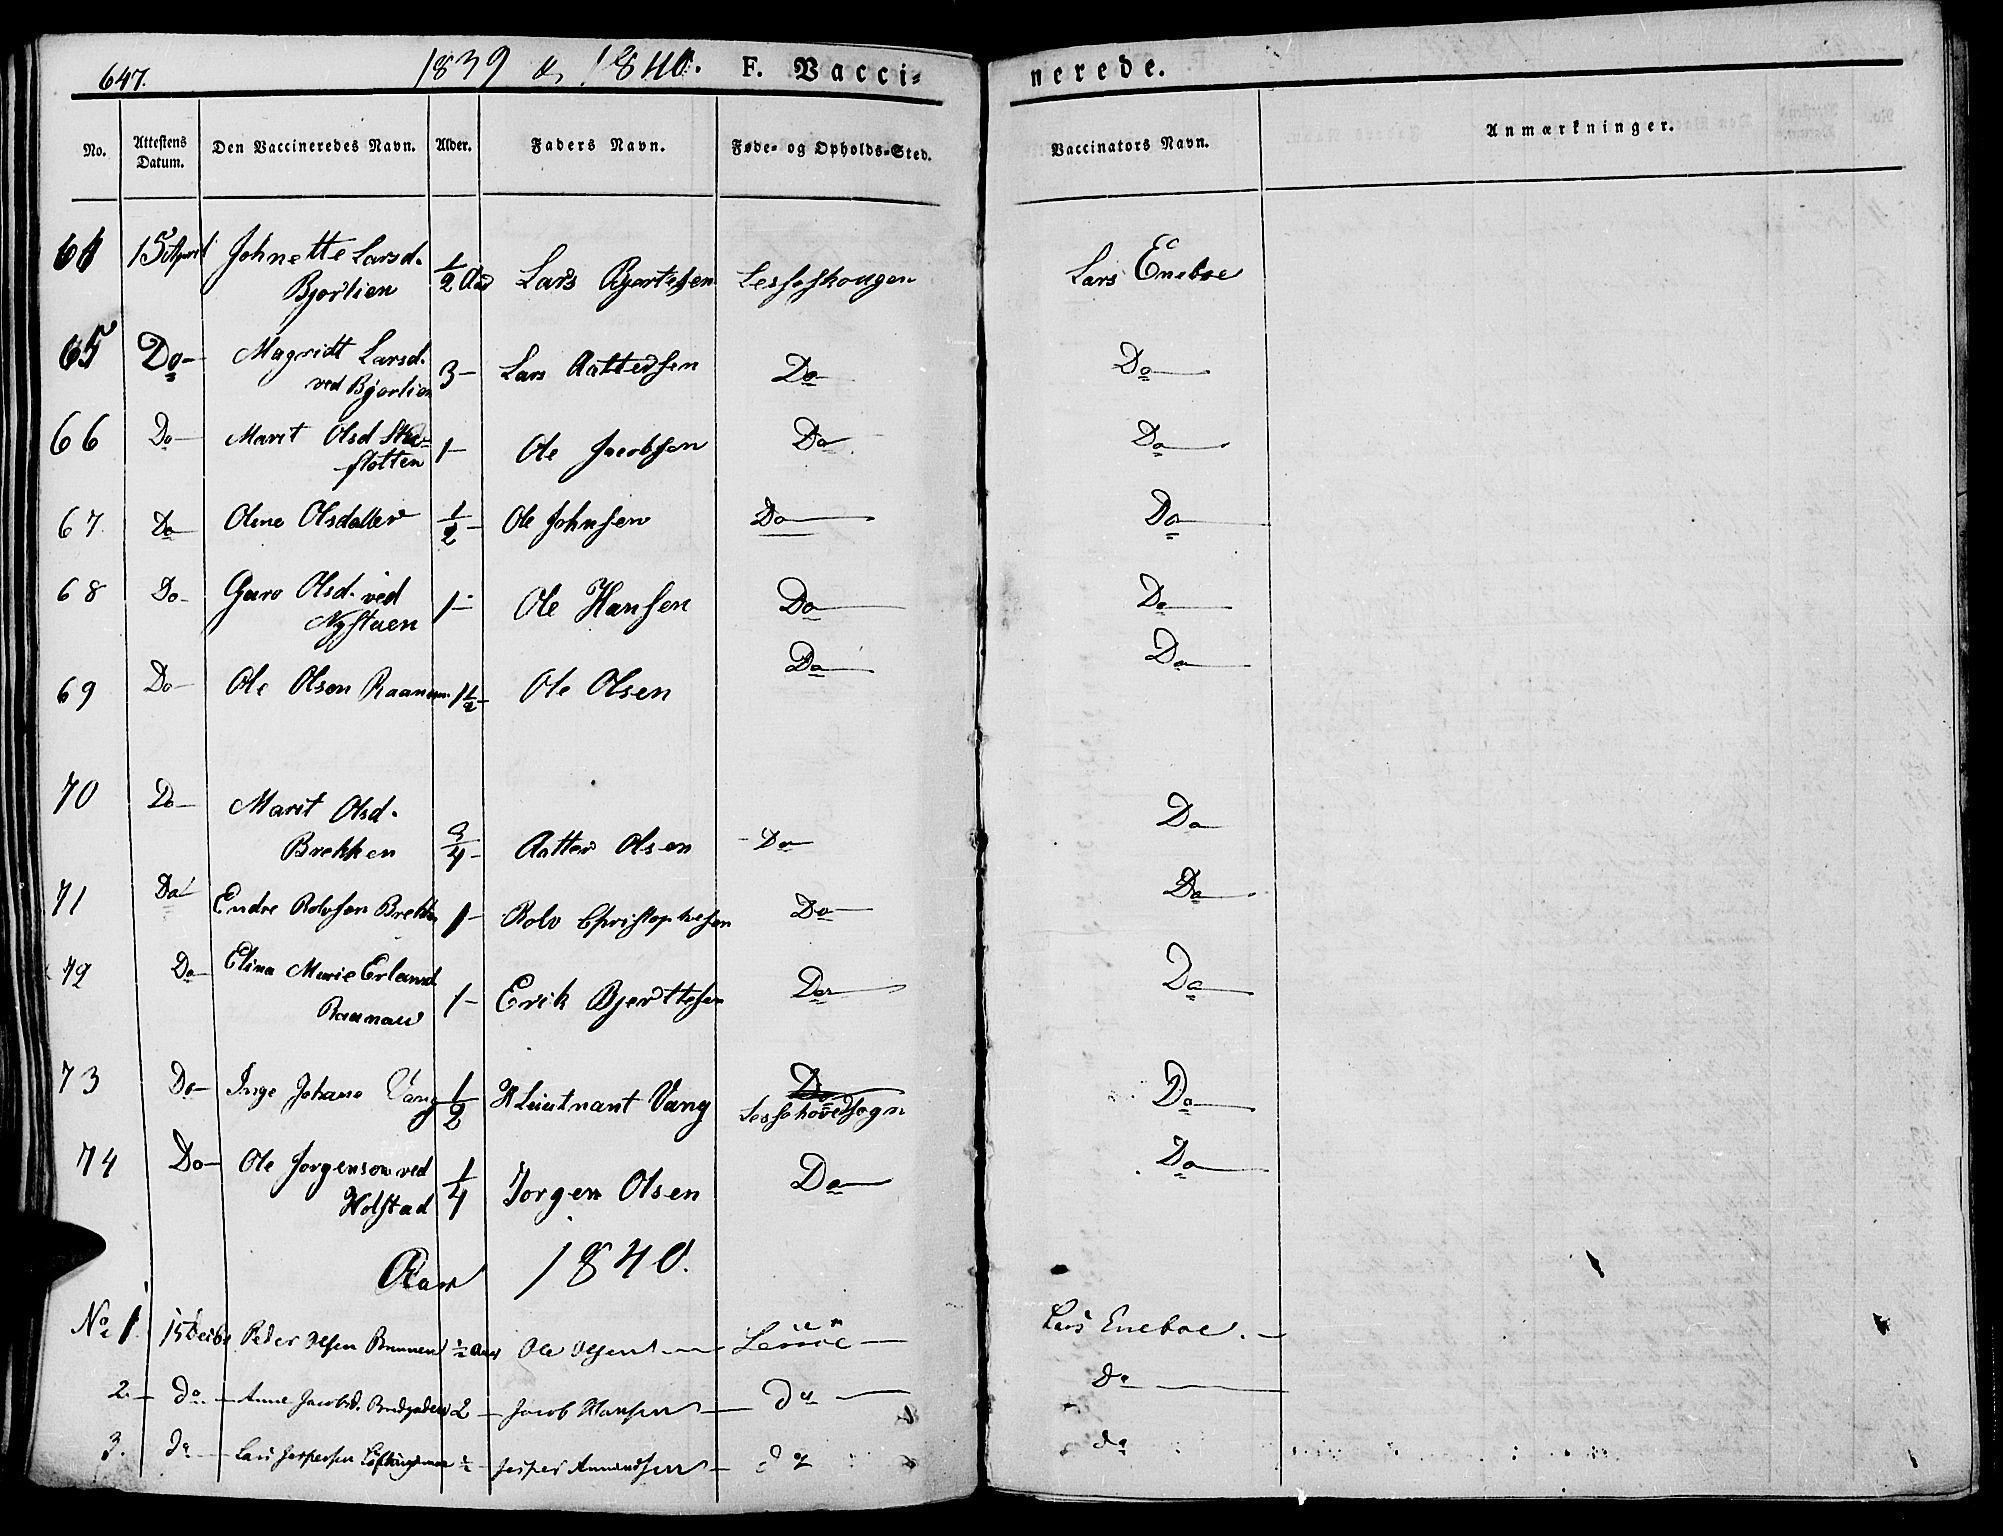 SAH, Lesja prestekontor, Ministerialbok nr. 5, 1830-1842, s. 647